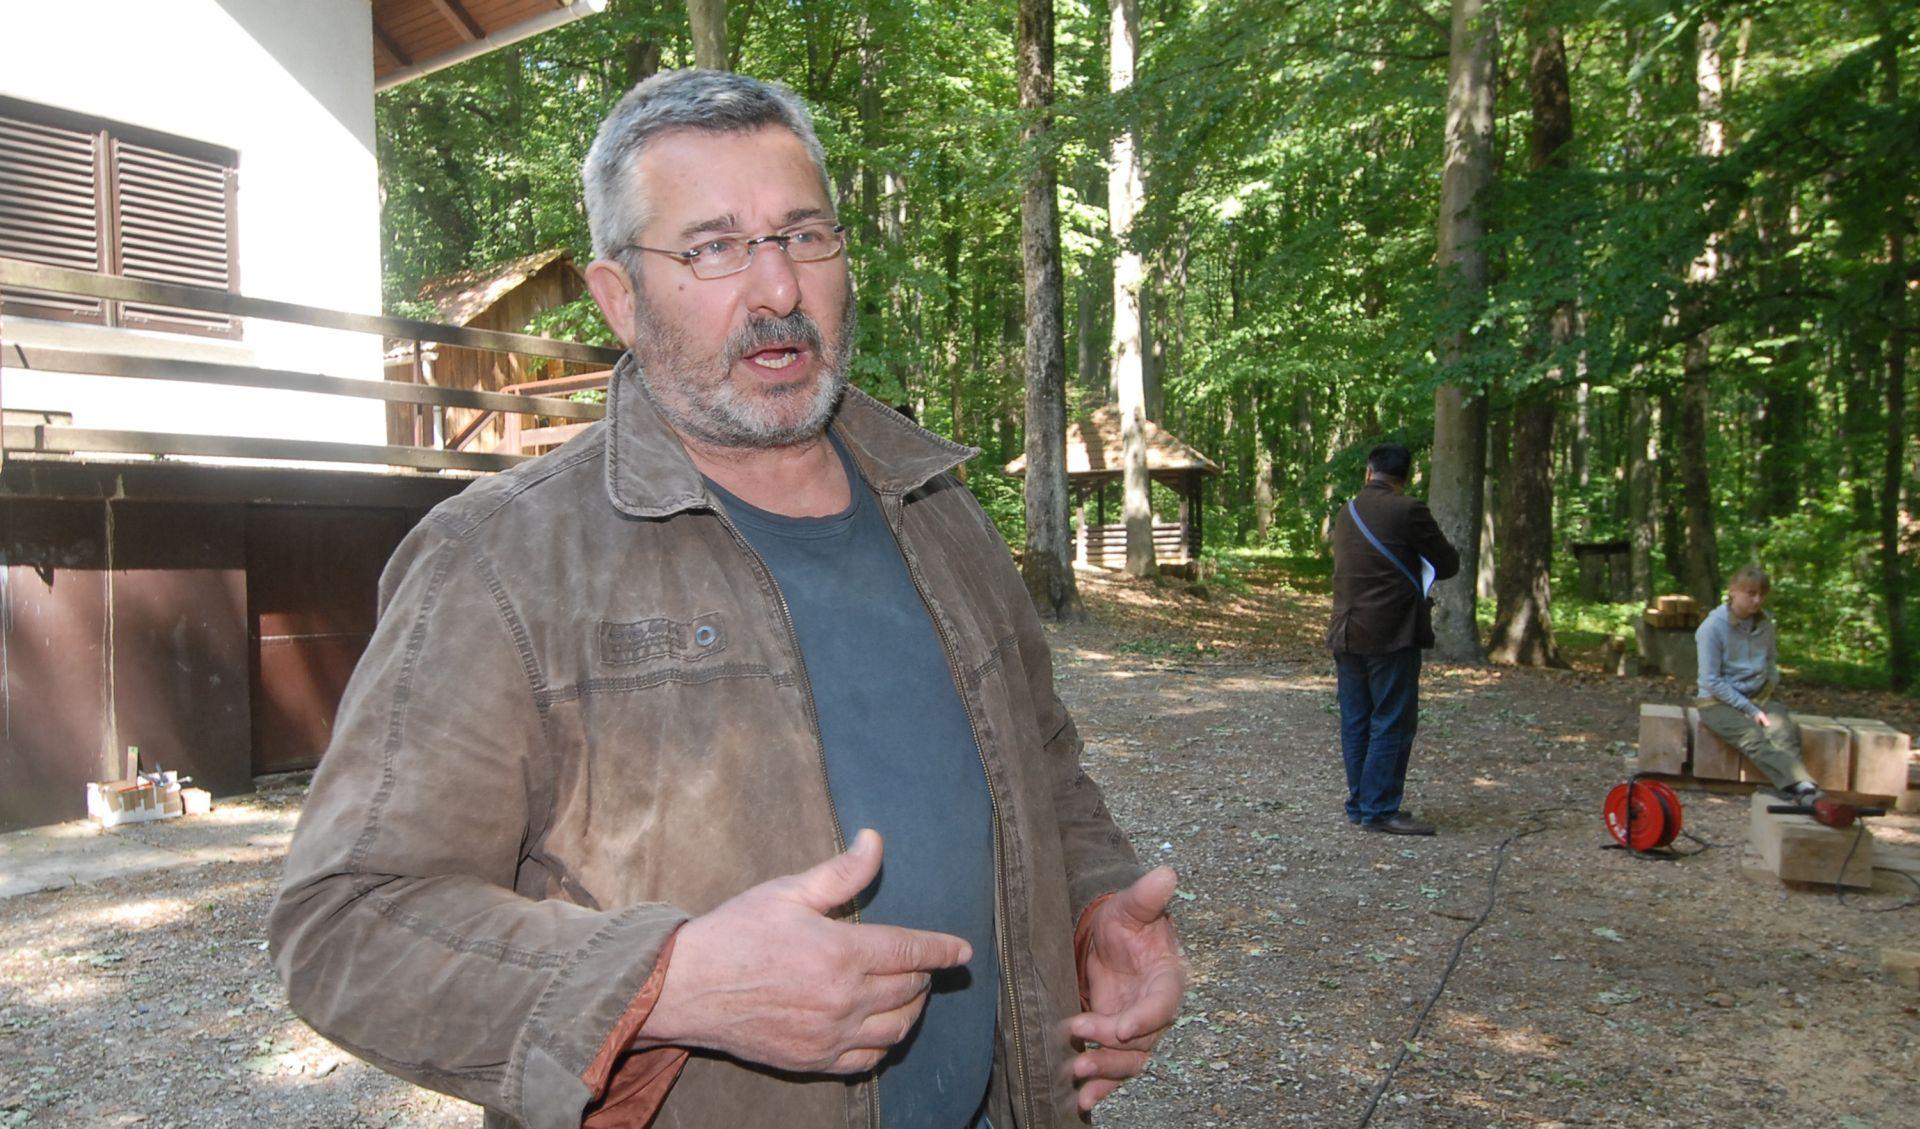 Preminuo kipar Slavomir Drinković